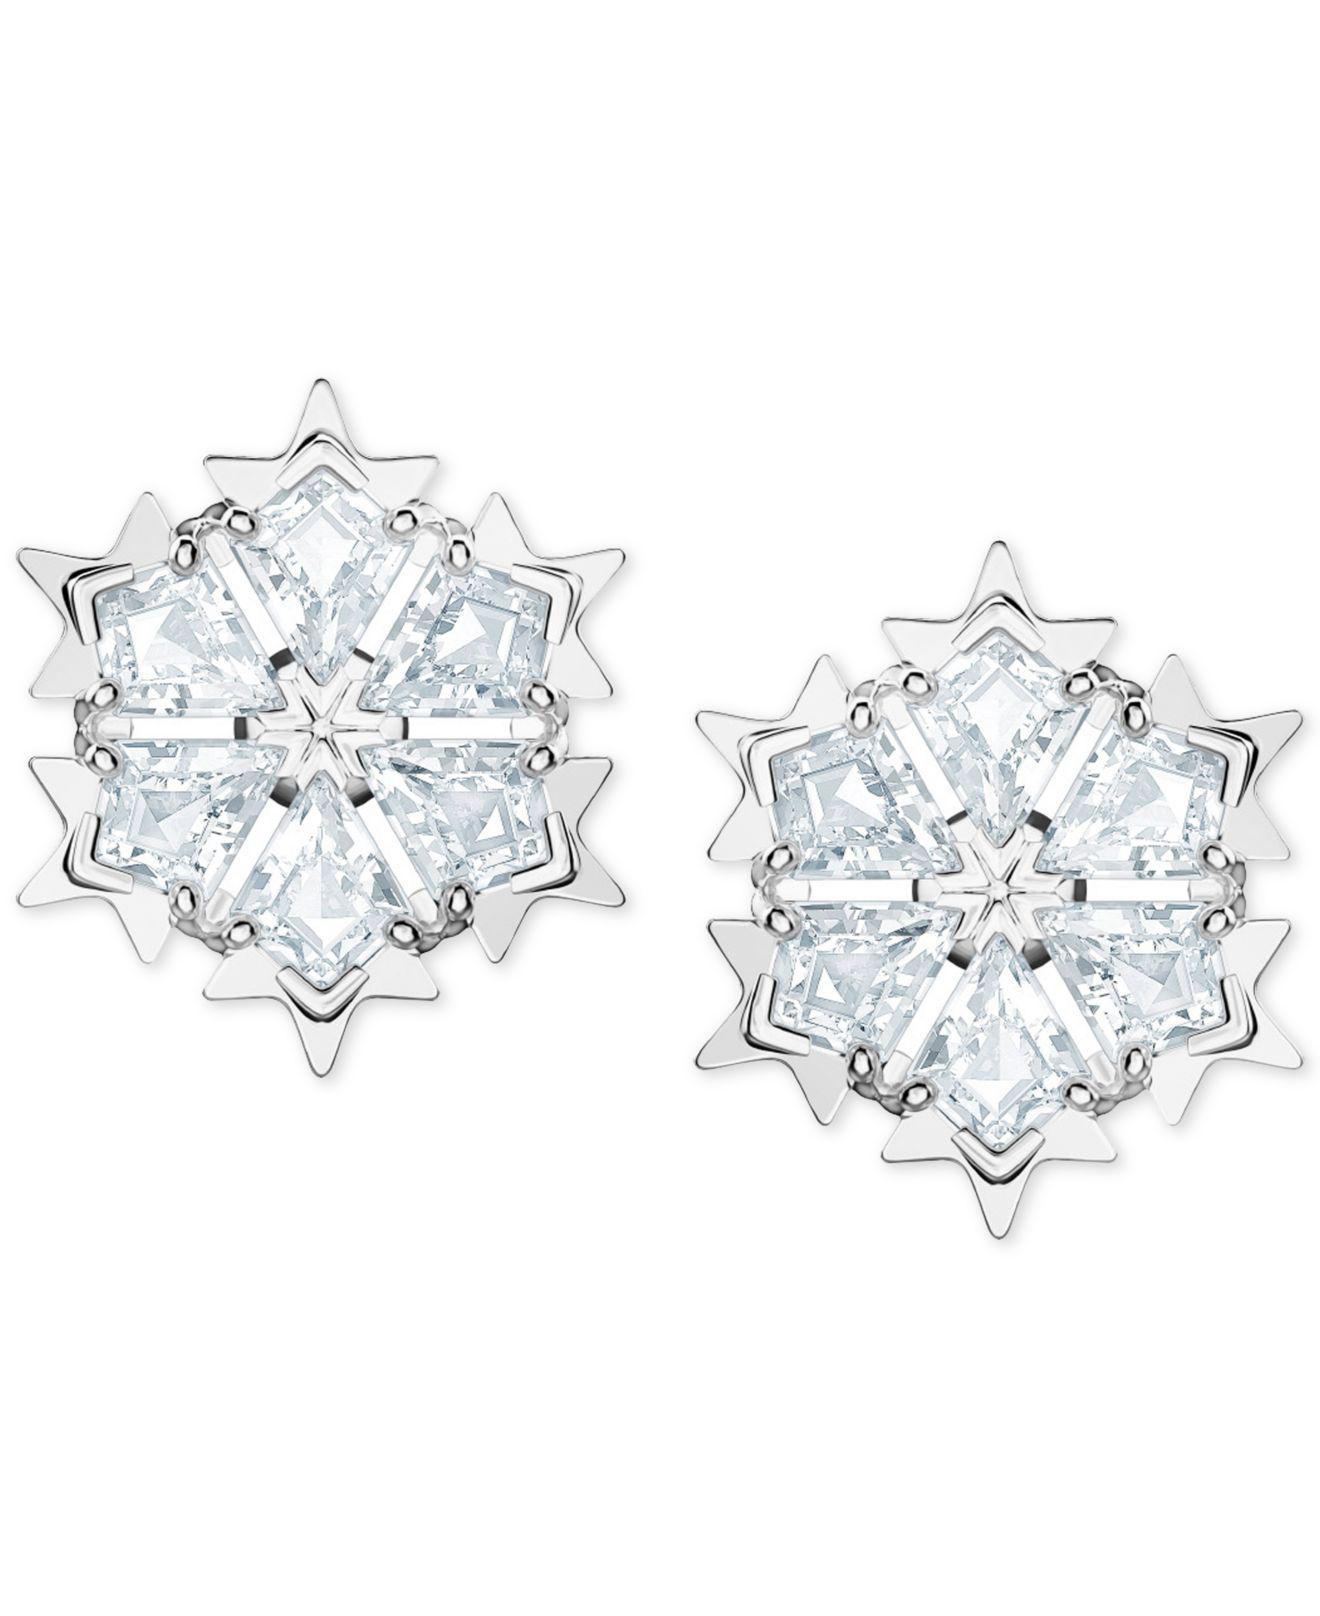 43ce067e5 Lyst - Swarovski Silver-tone Crystal Stud Earrings in White